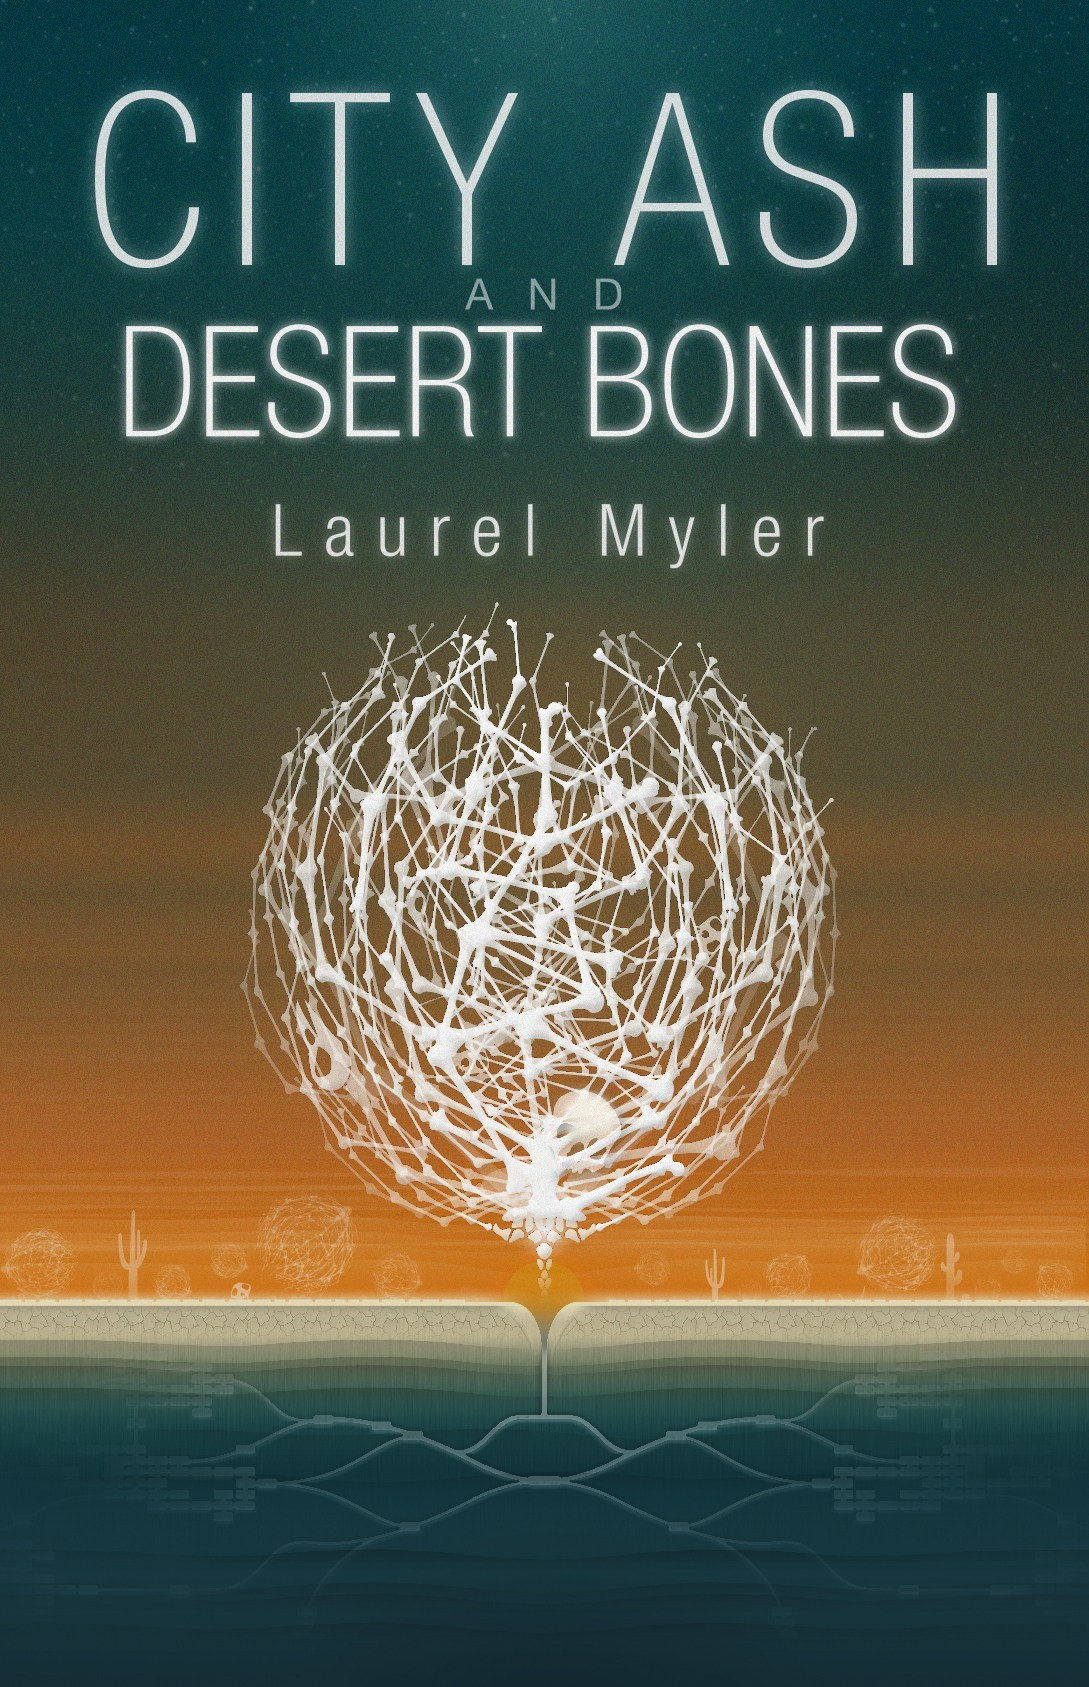 City Ash and Desert Bones